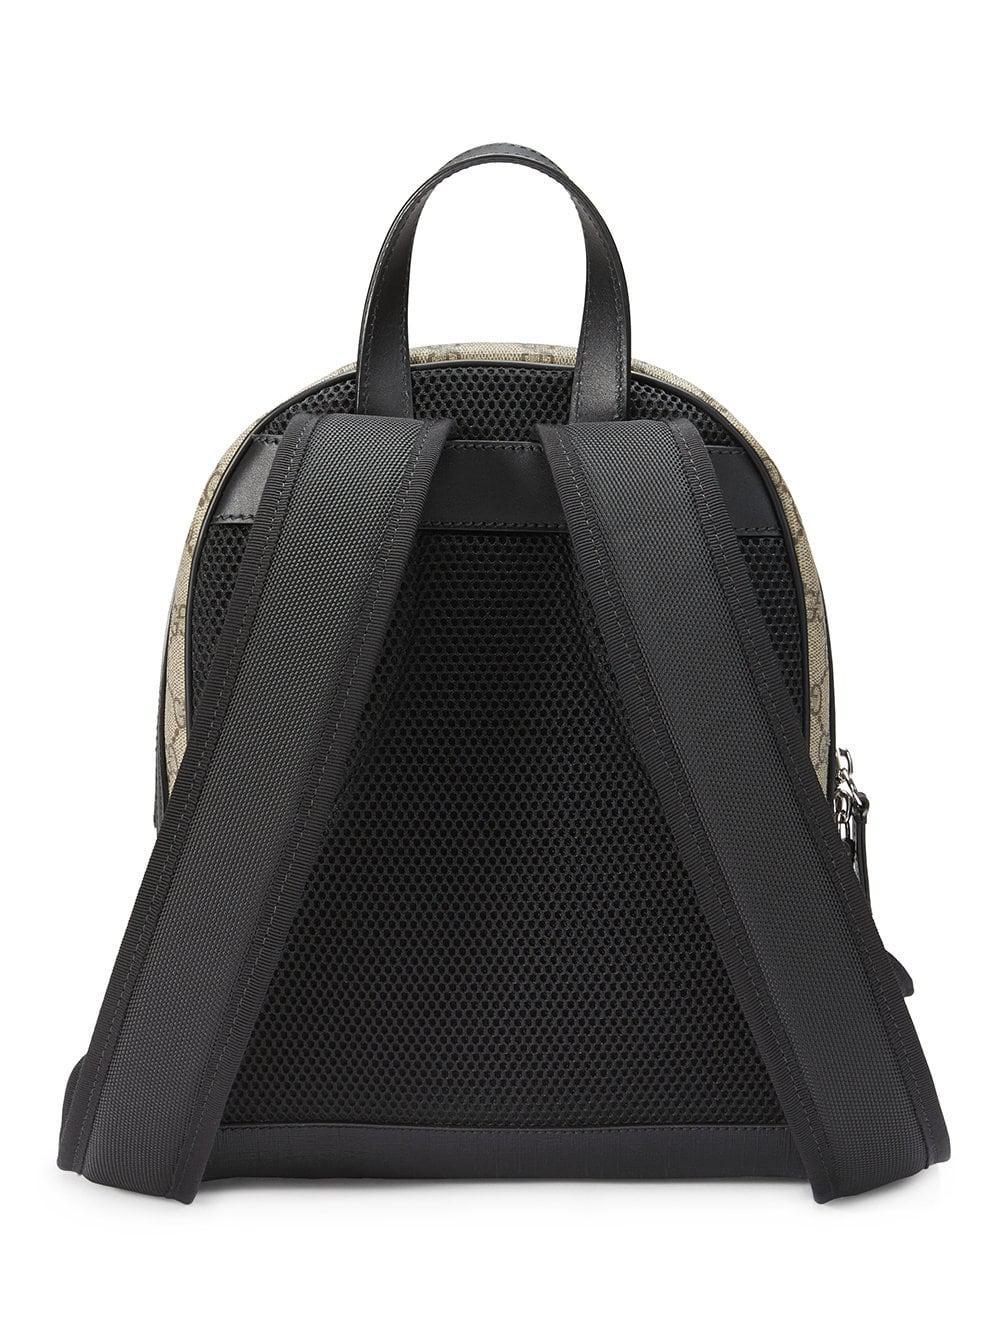 7c5b3f66cc3 Gucci - Brown GG Supreme Small Backpack - Lyst. View fullscreen